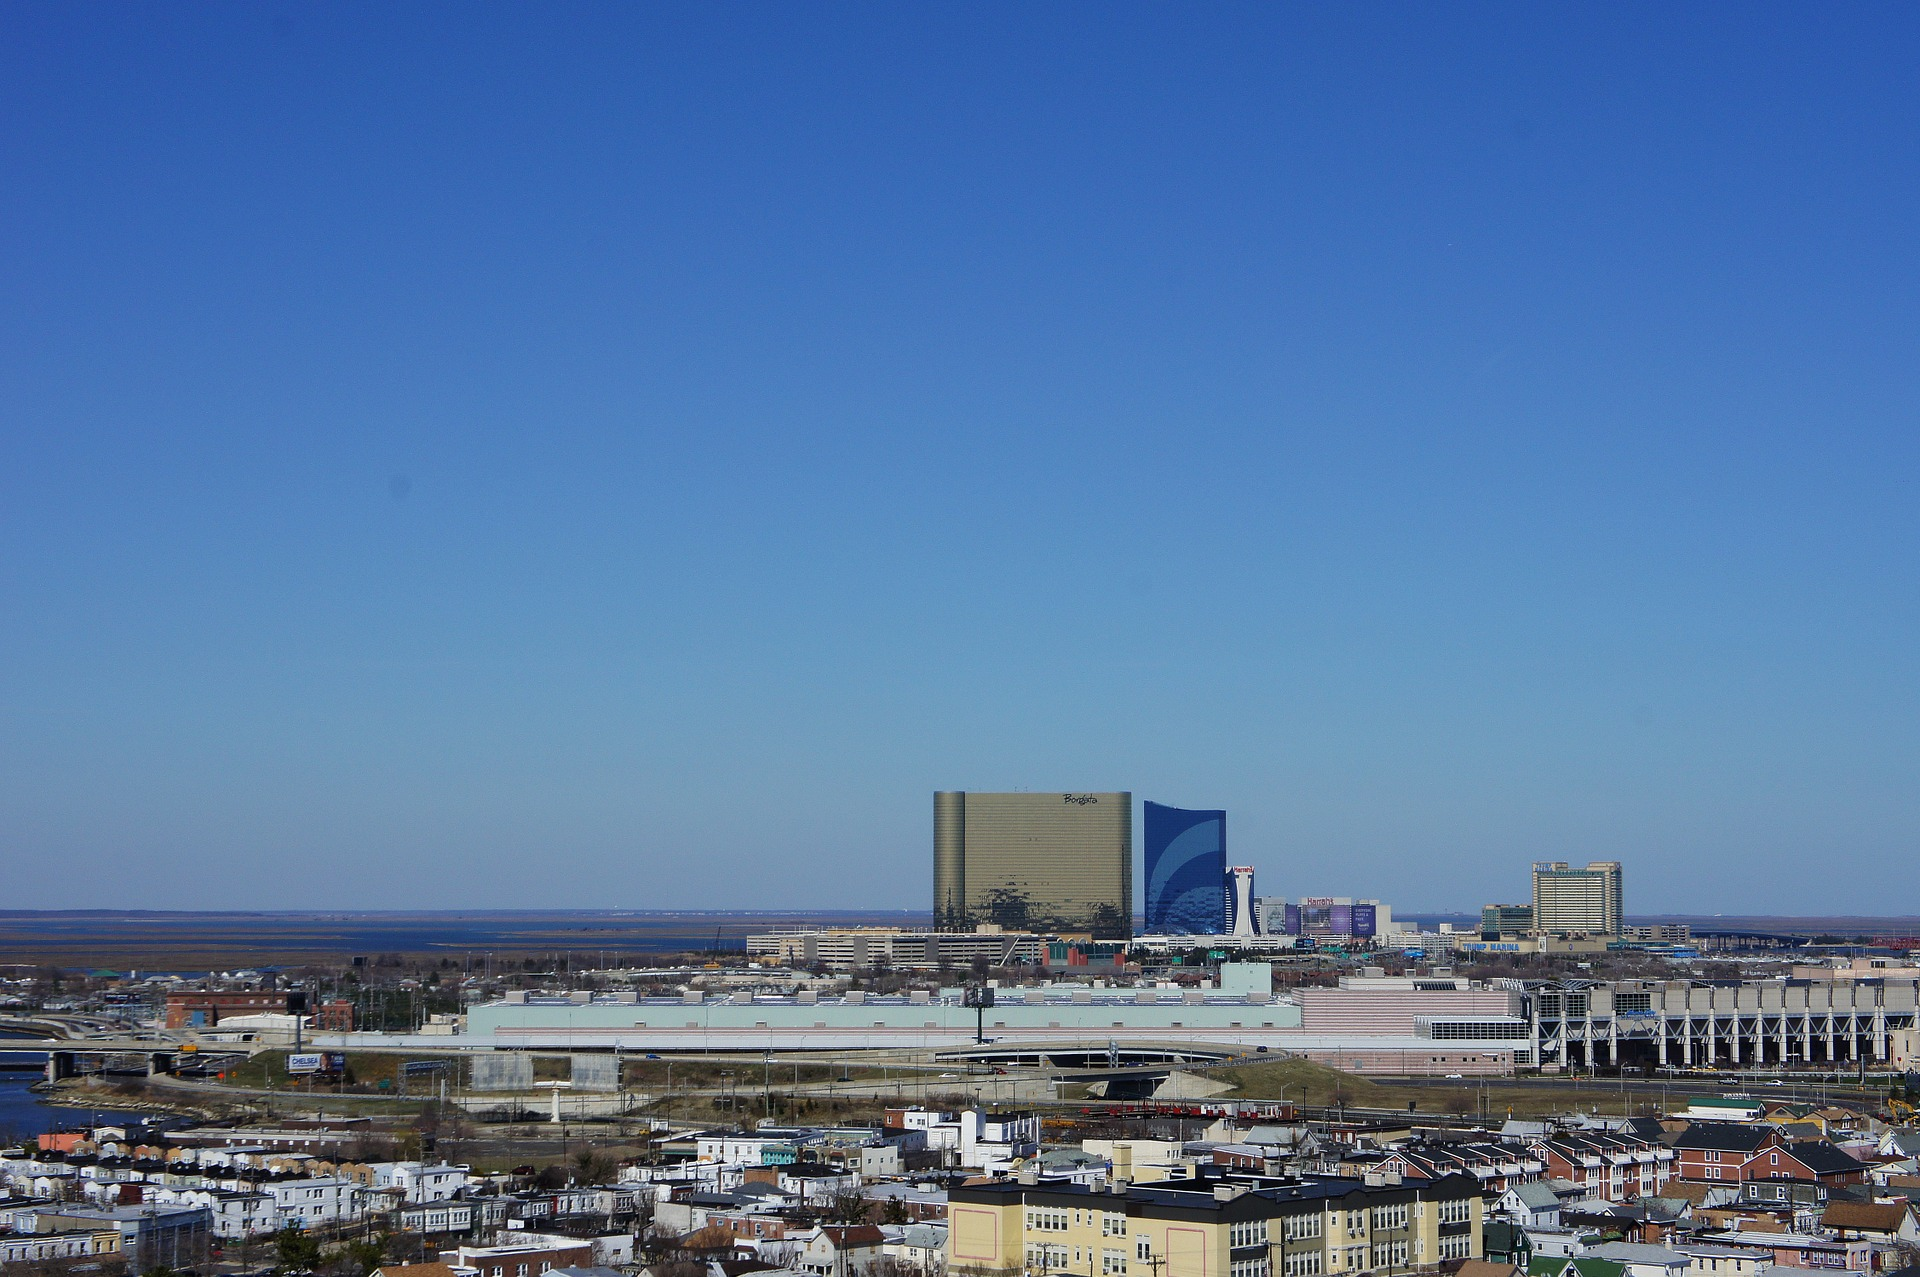 New Jersey Slot Machine Casino Gambling - Atlantic City and the Borgata Casino.